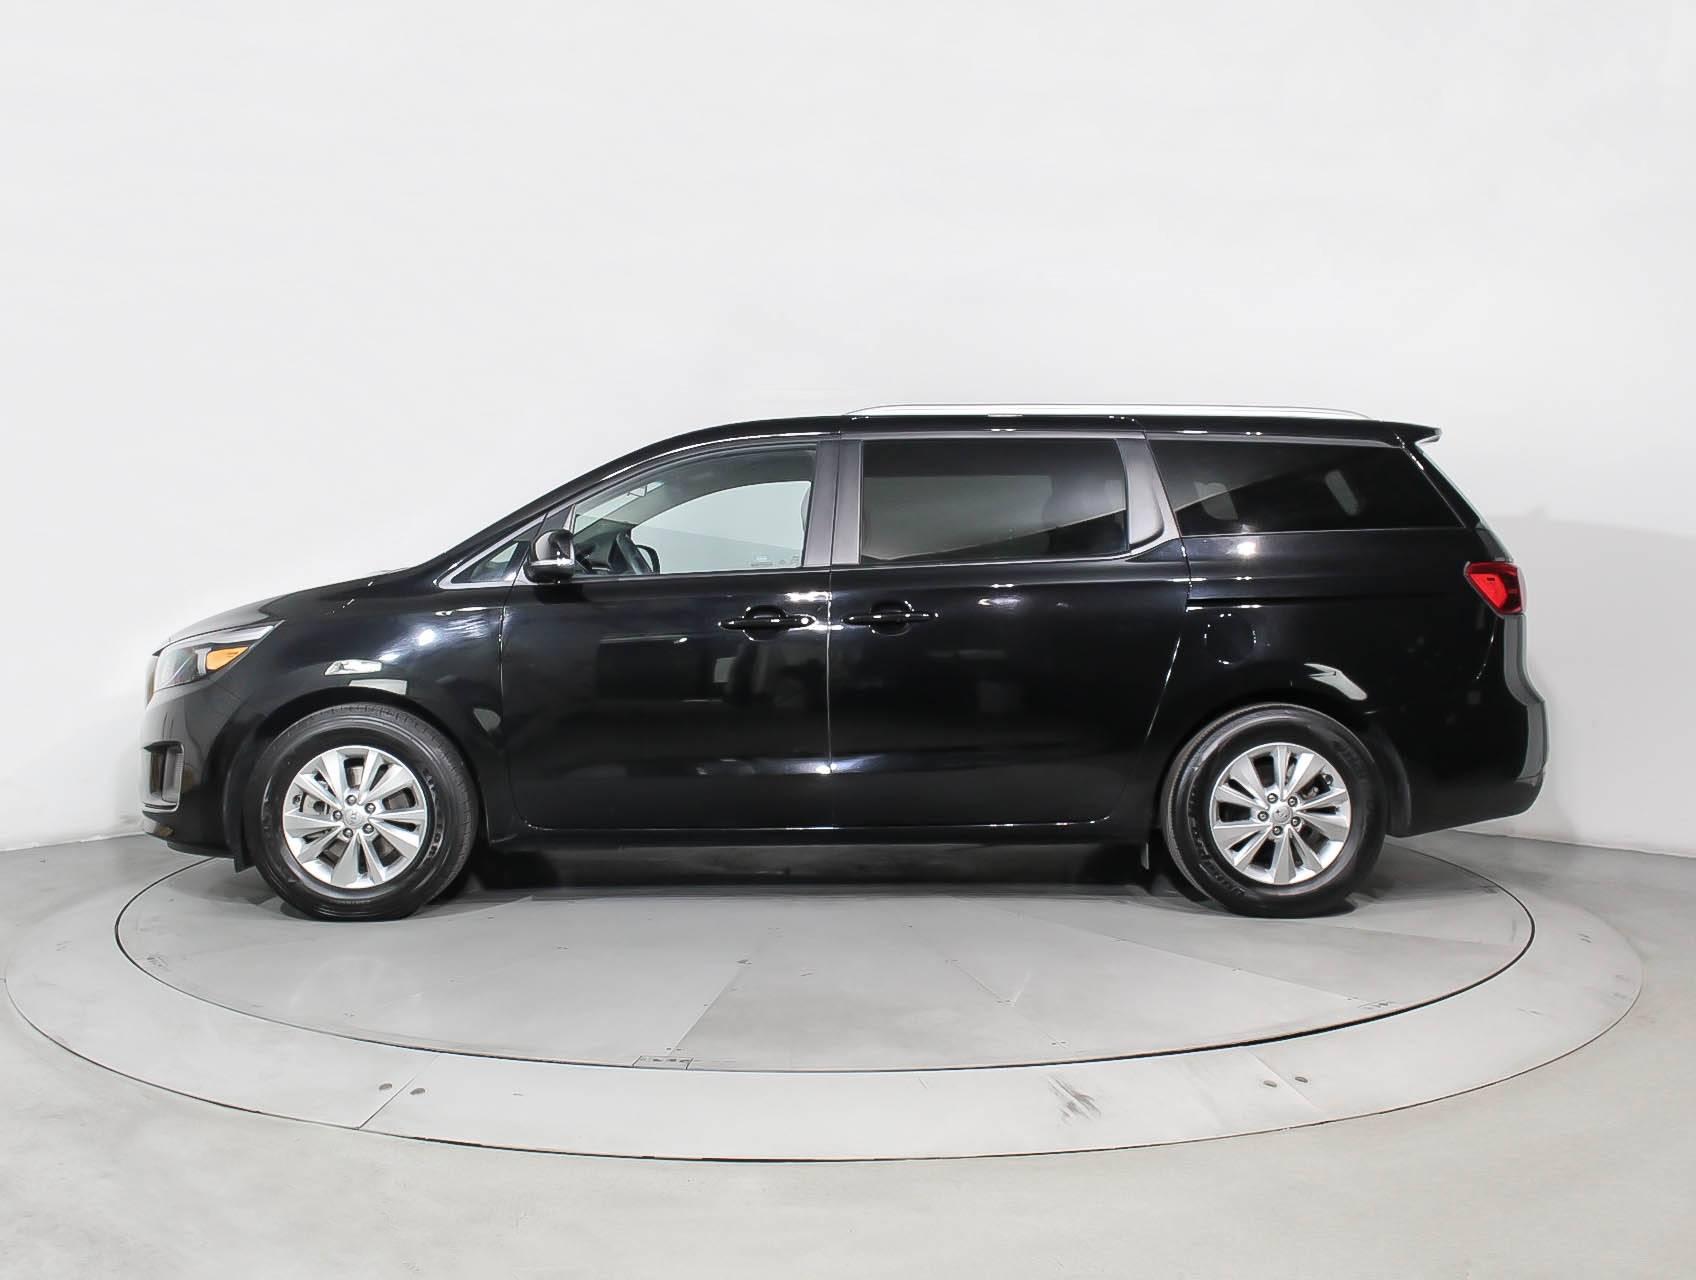 Used 2016 KIA SEDONA Lx Minivan for sale in MIAMI, FL   92001